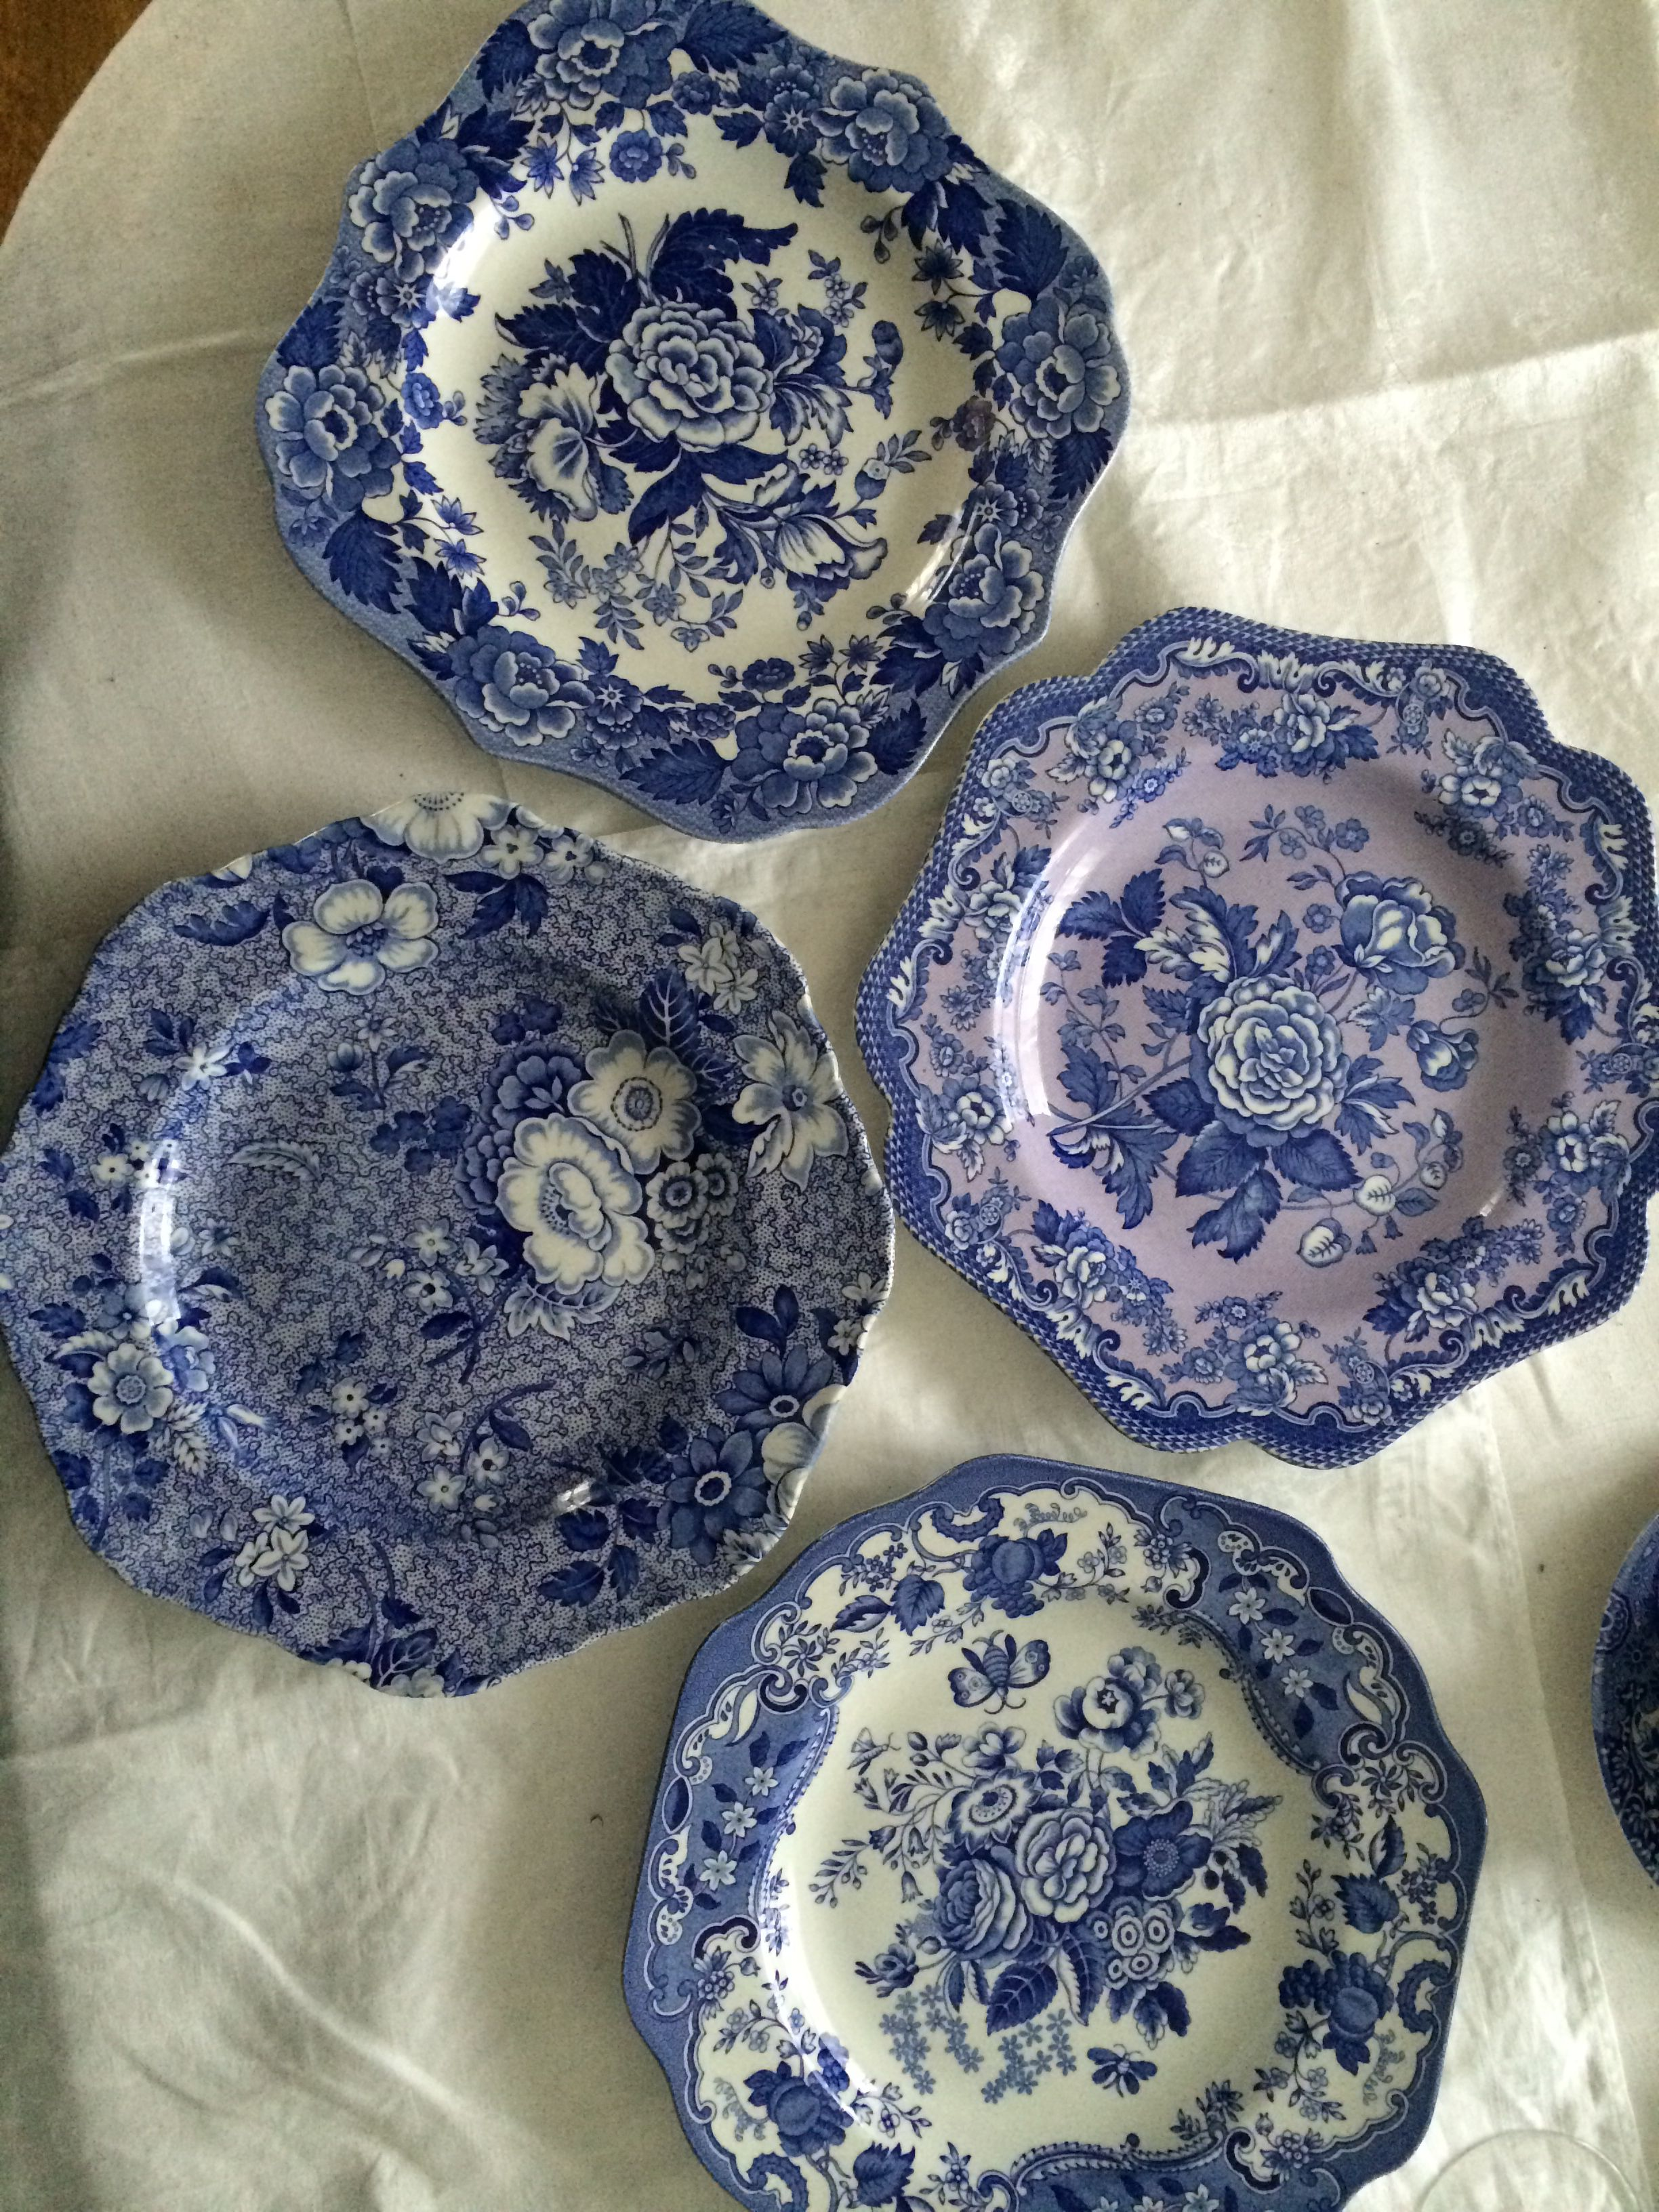 Spode Garden Series Salad Plates Blue White Decor Blue And White China Blue And White Blue and white salad plates